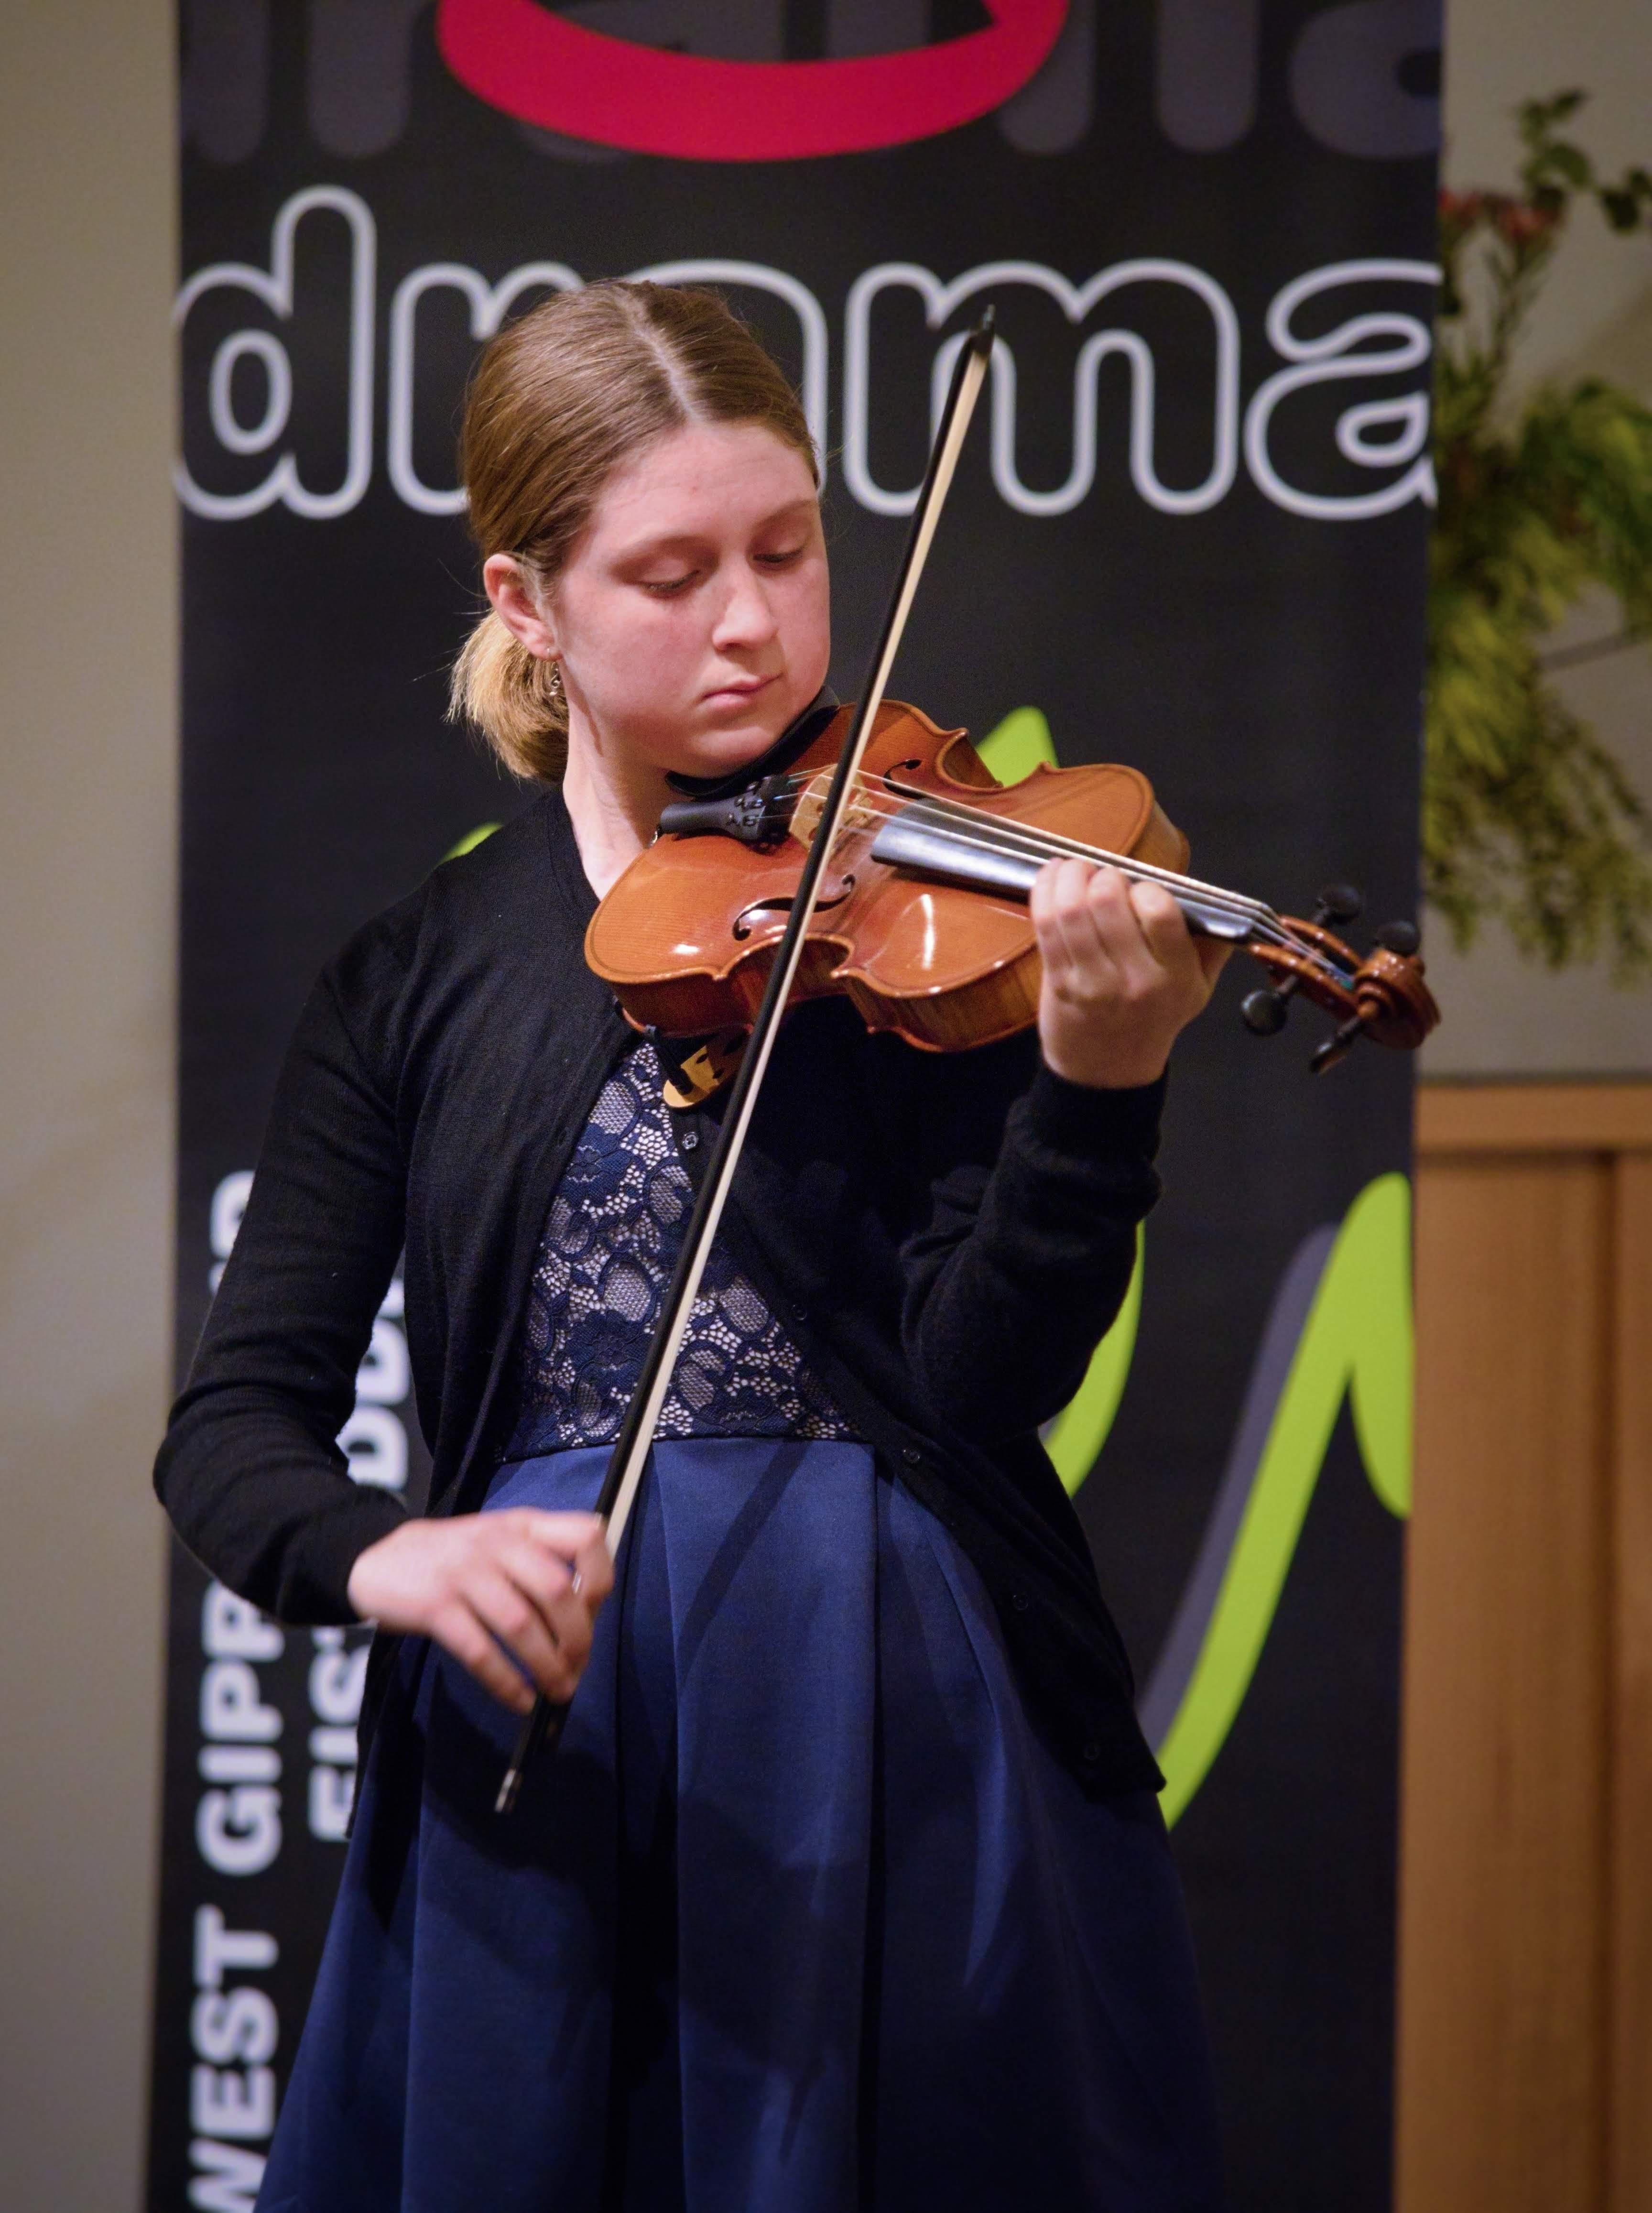 WGE Instrumental Autumn Lee Displays Her Skill on the Violin